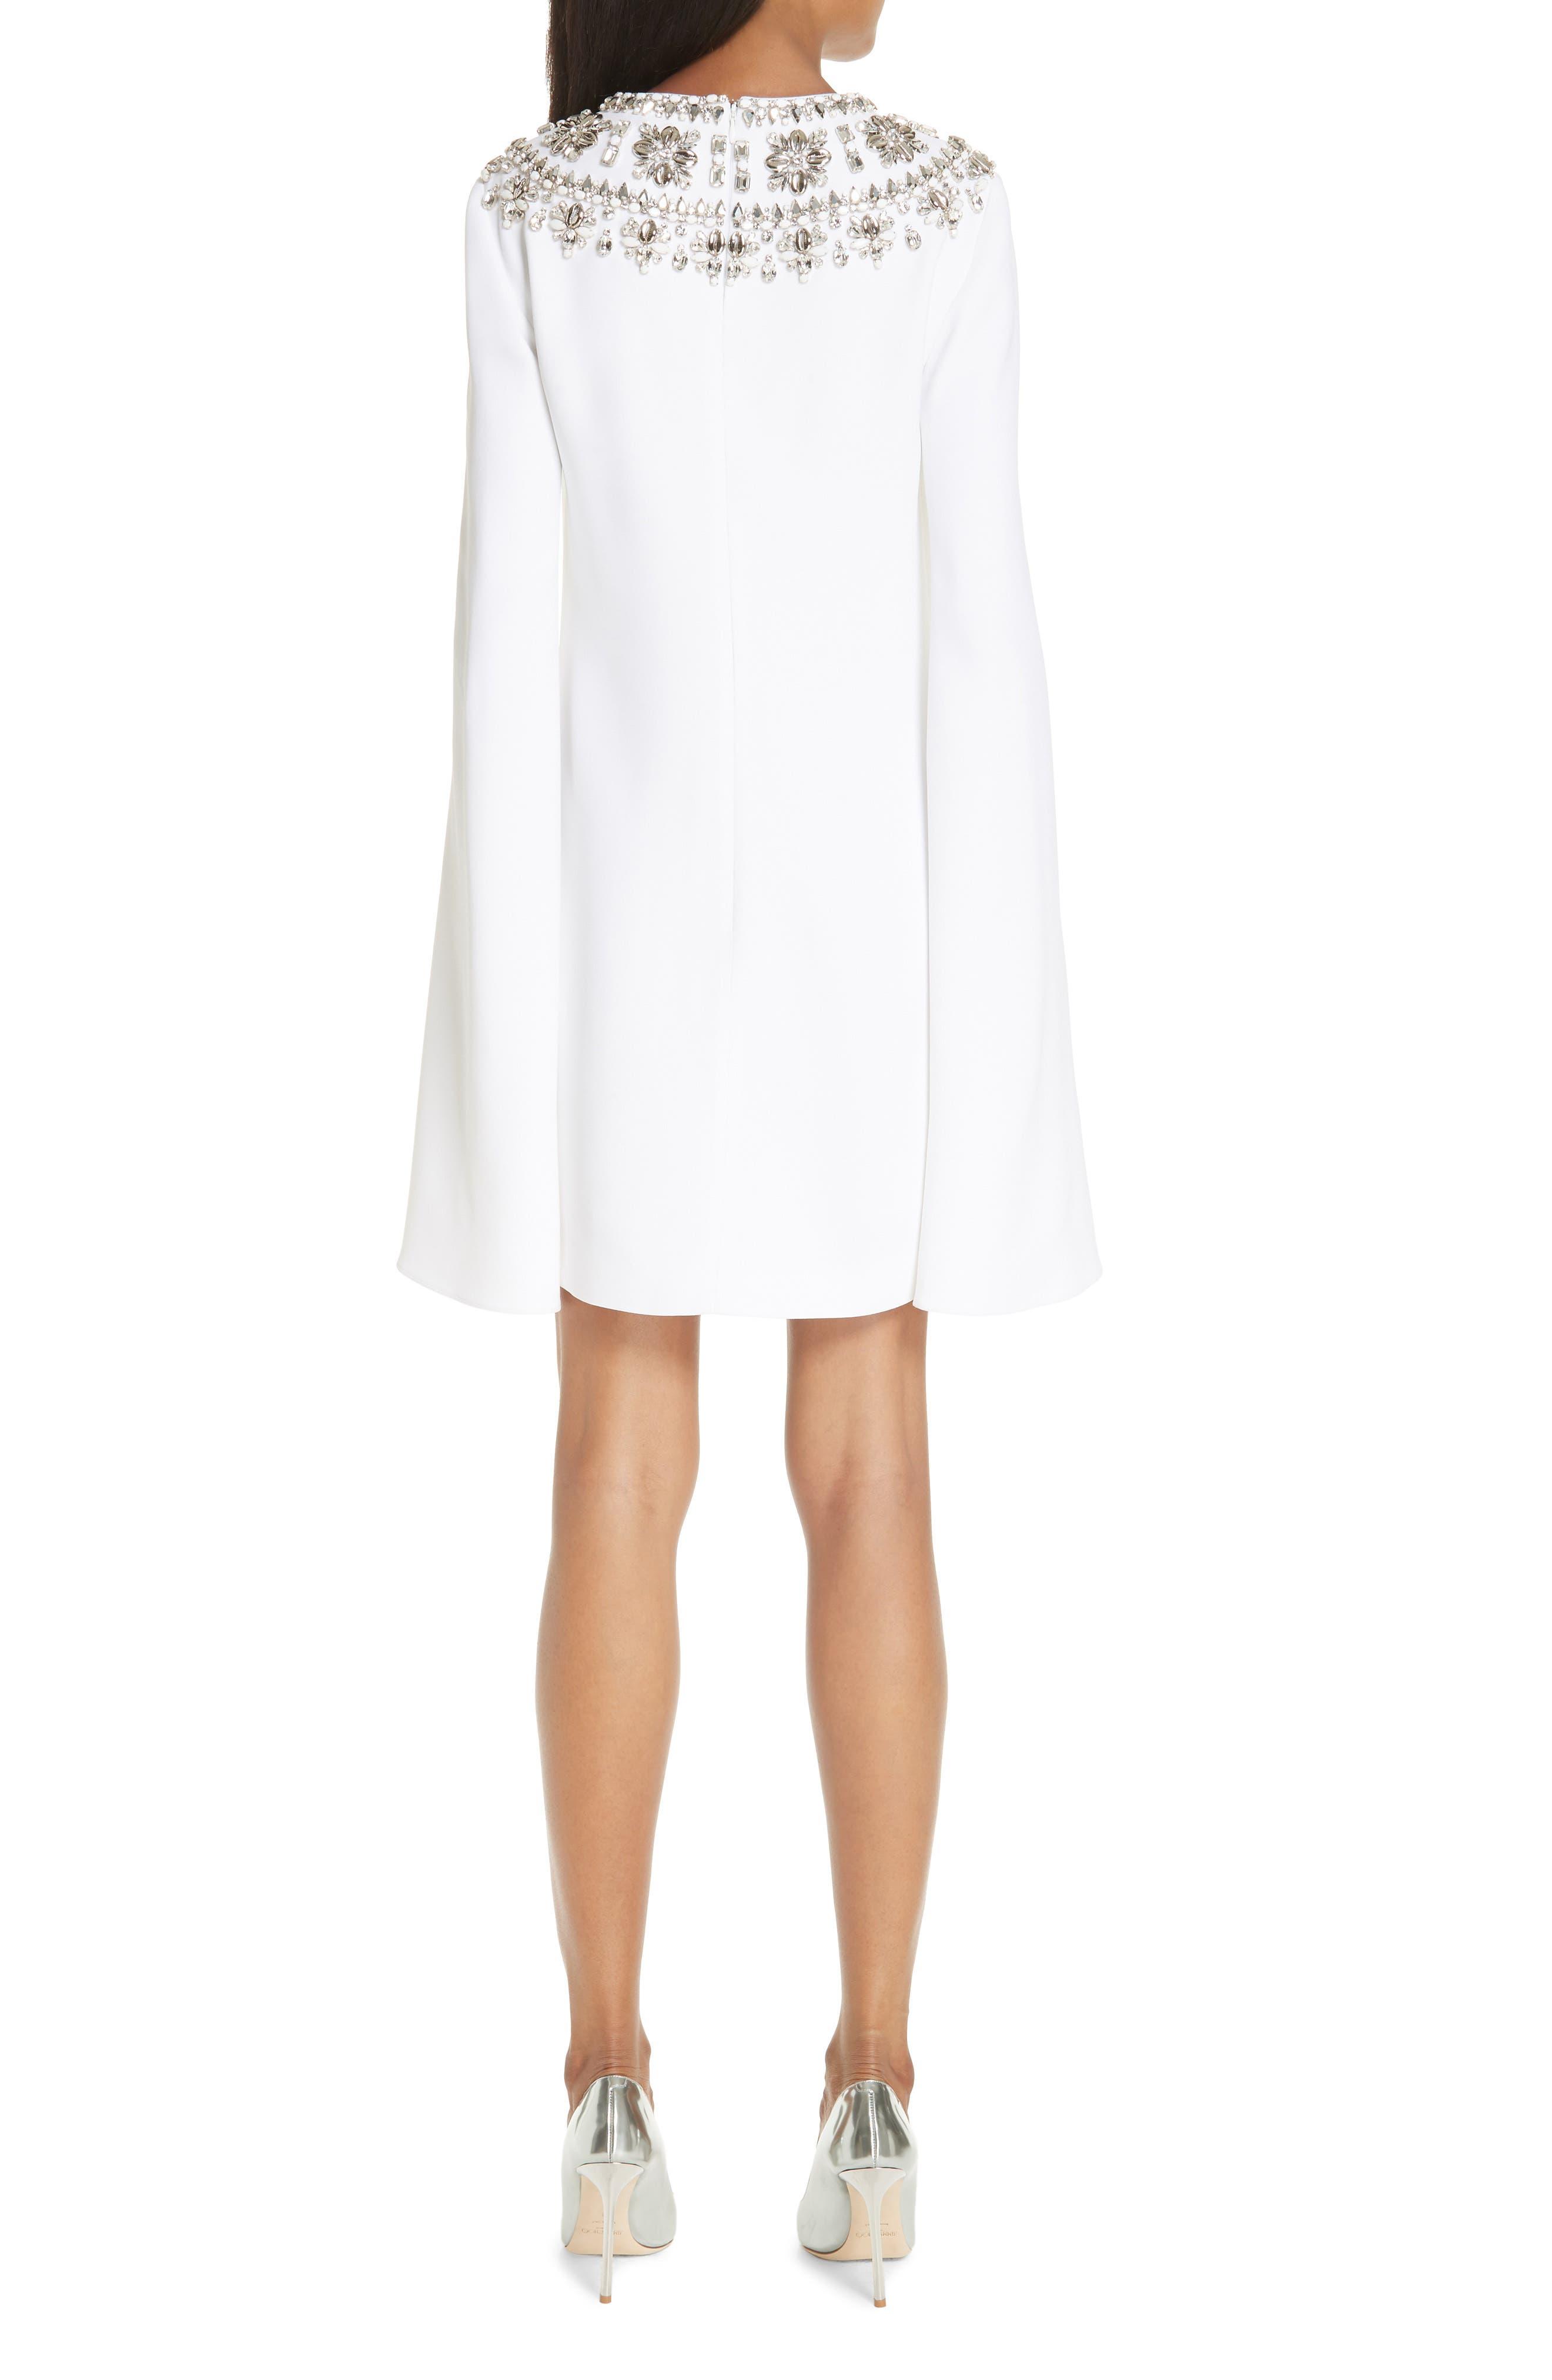 MICHAEL KORS, Crystal Embellished Split Sleeve Double Crepe Sable Dress, Alternate thumbnail 2, color, OPTIC WHITE W/ SILVER